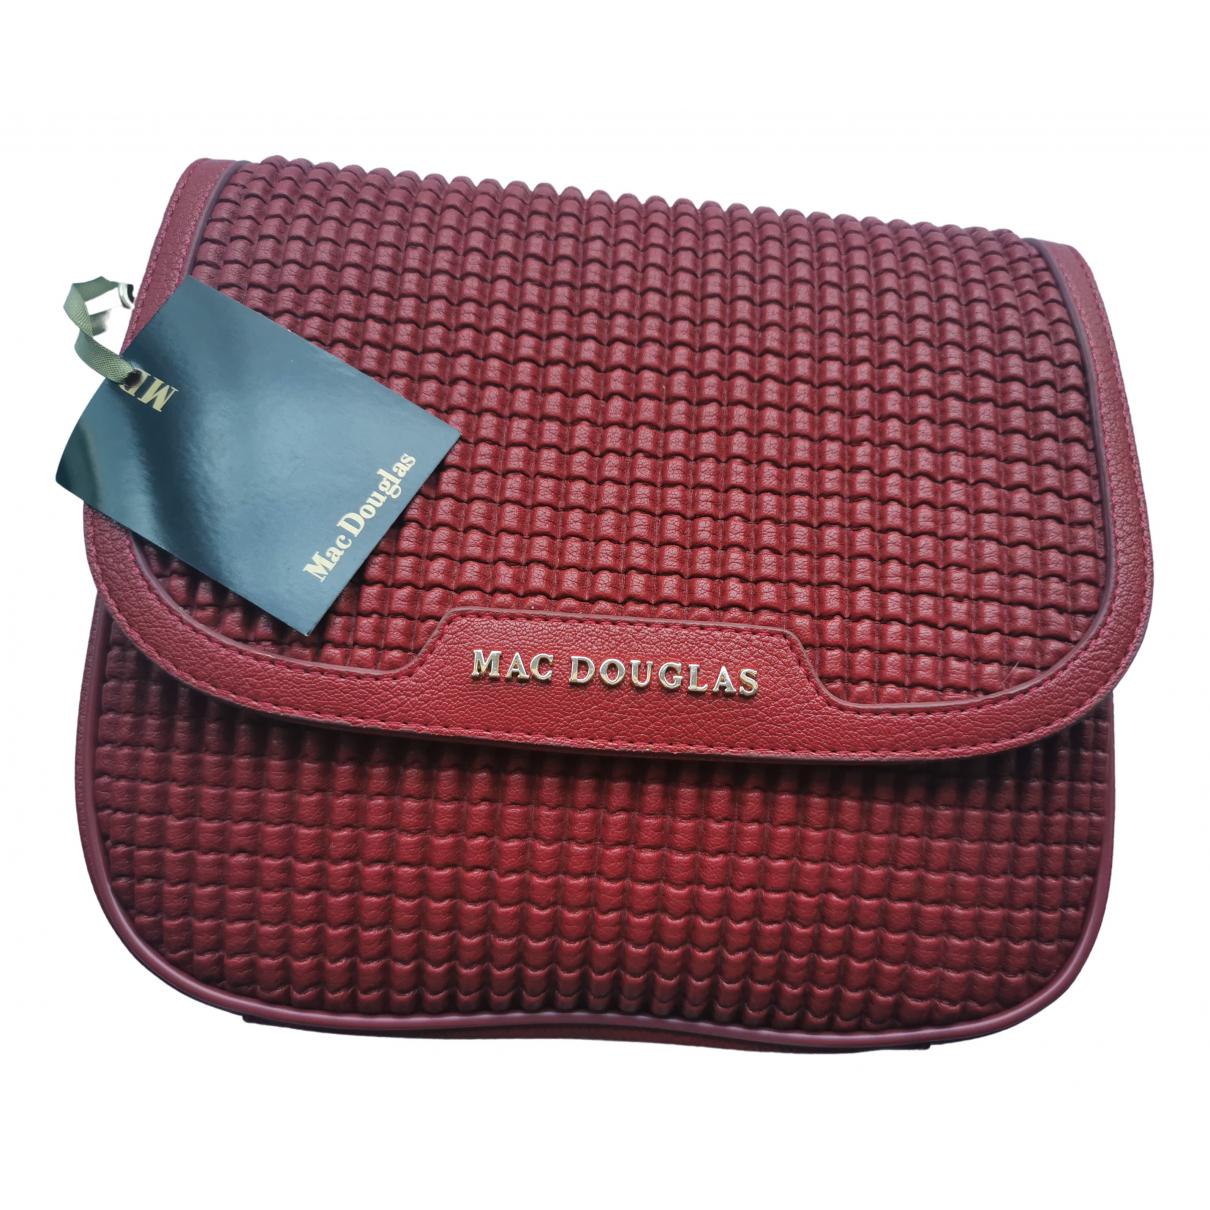 Mac Douglas \N Handtasche in  Bordeauxrot Synthetik